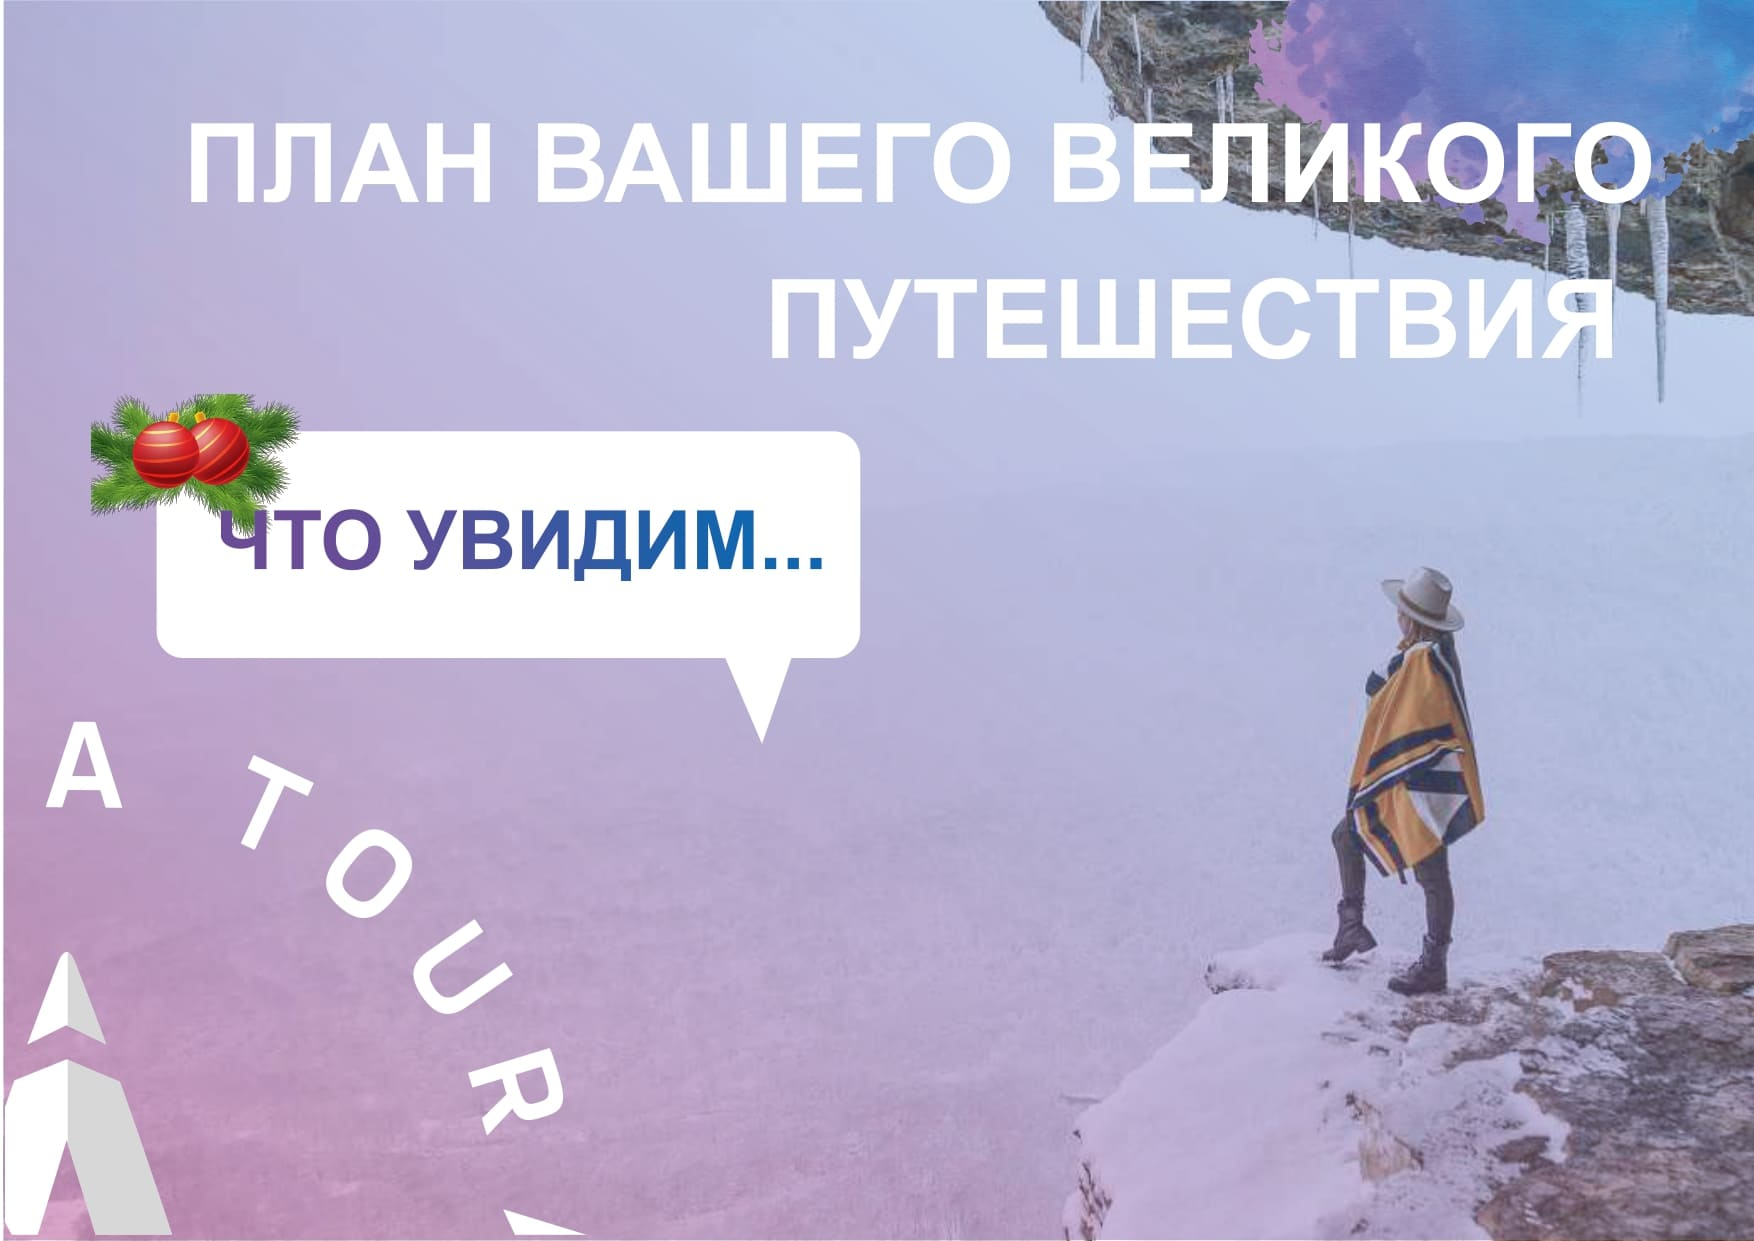 Новогодний Адыгея_compressed (1)_page-0004